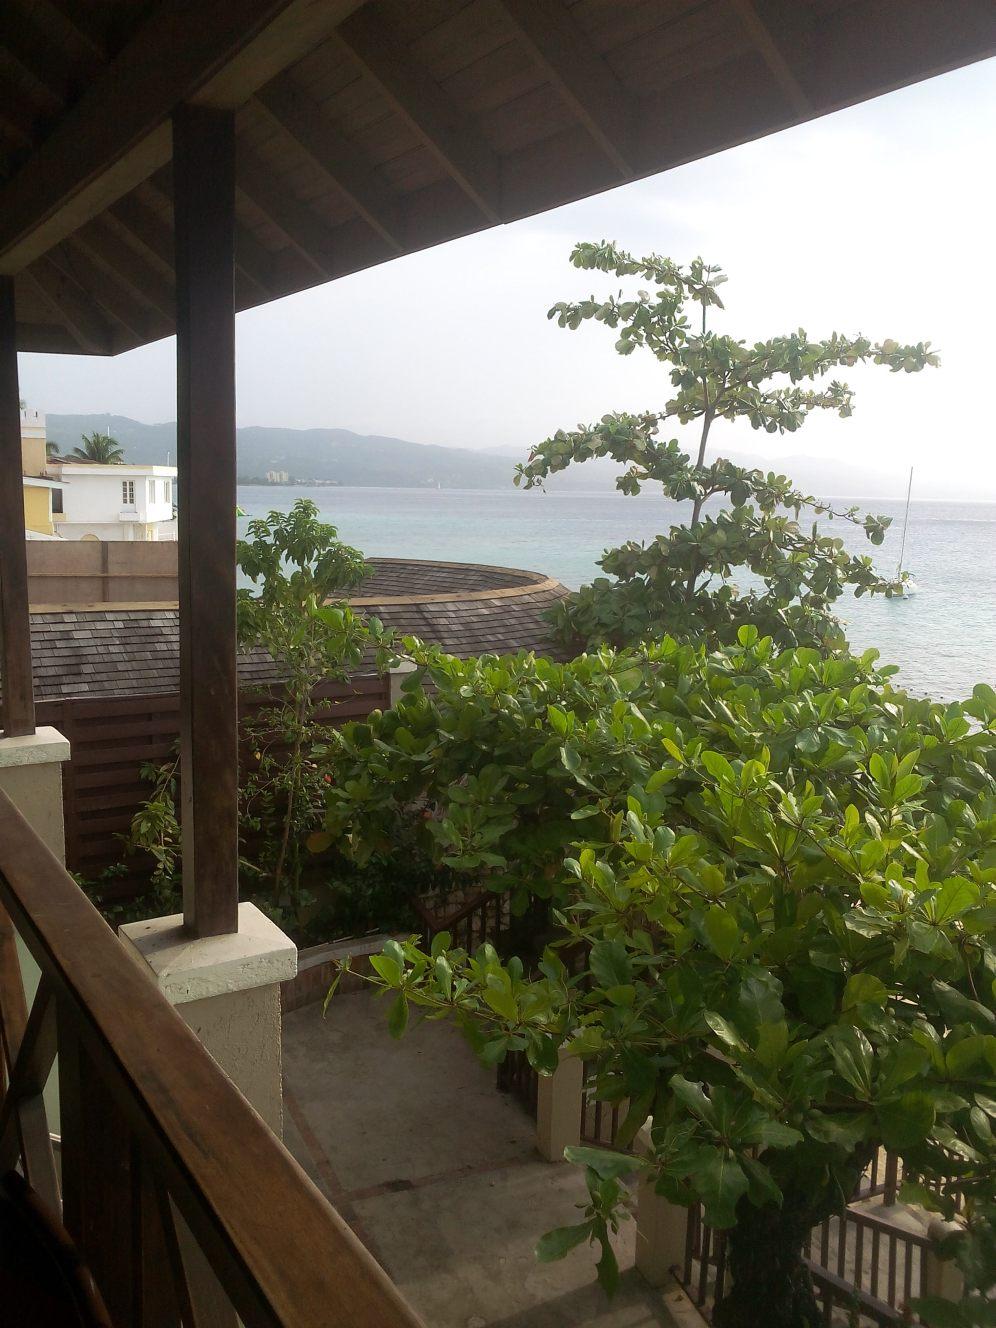 greenery beach jamaica montego bay